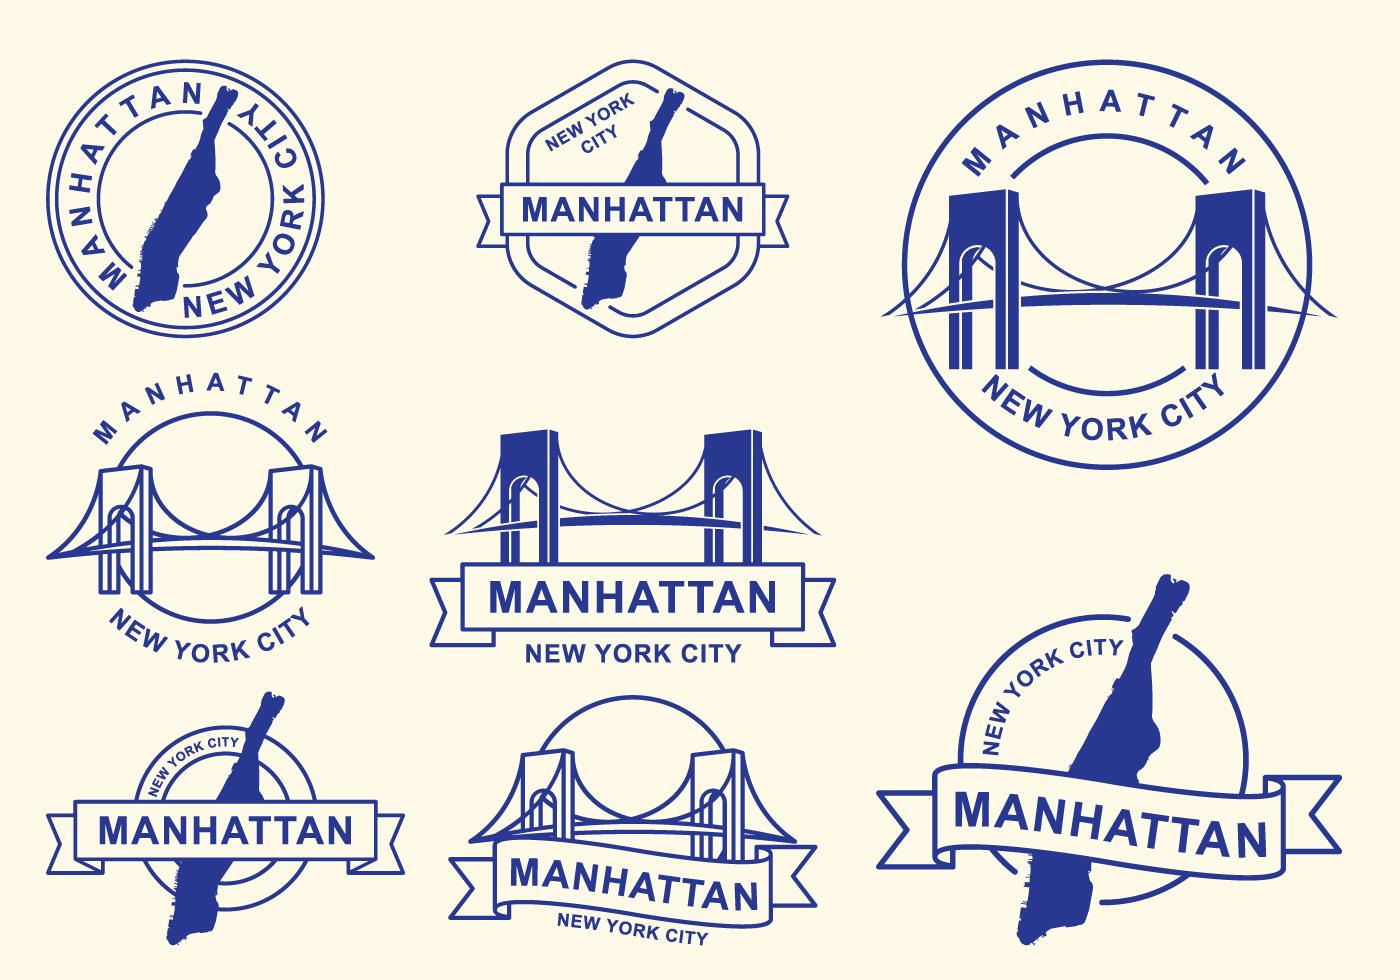 Stamps Of Manhattan Borough, New York City - Download Free ...